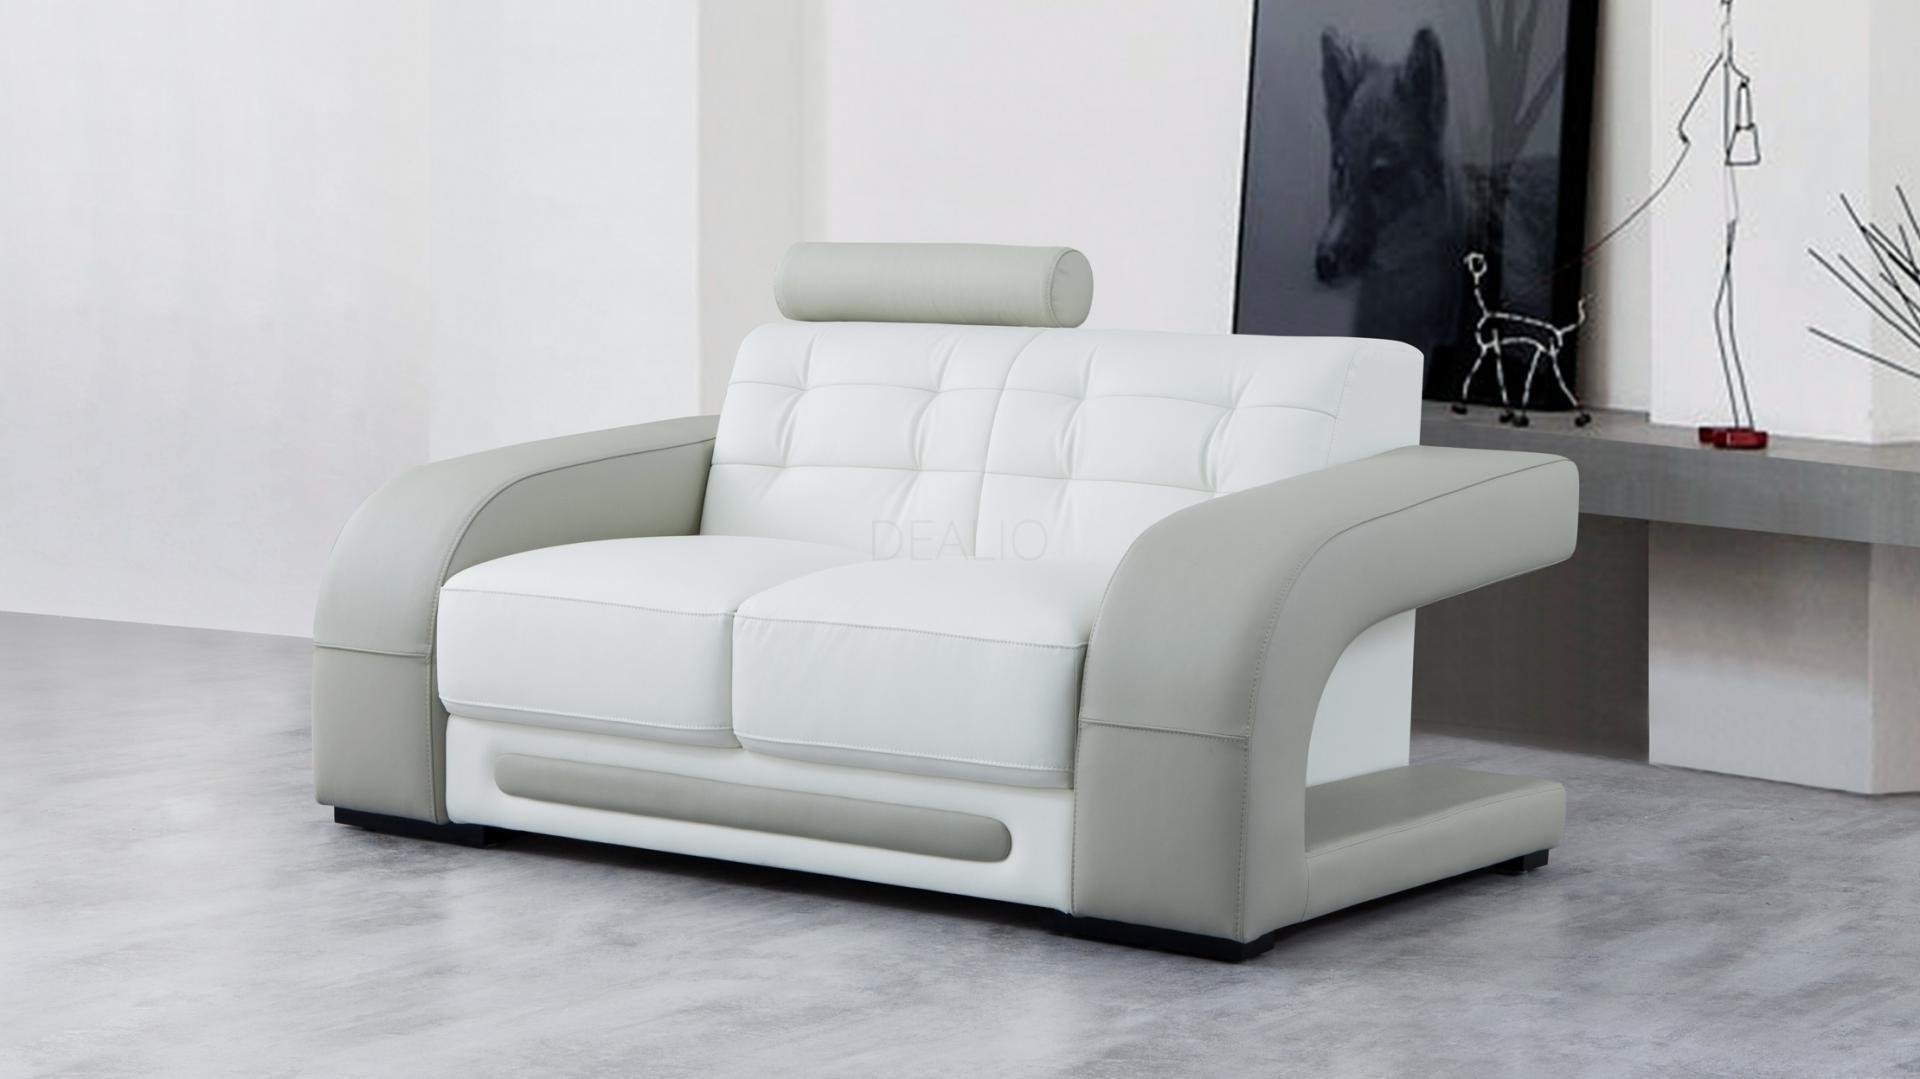 Casanova Leather Sofa Suite 3 2 1 Lounge Life